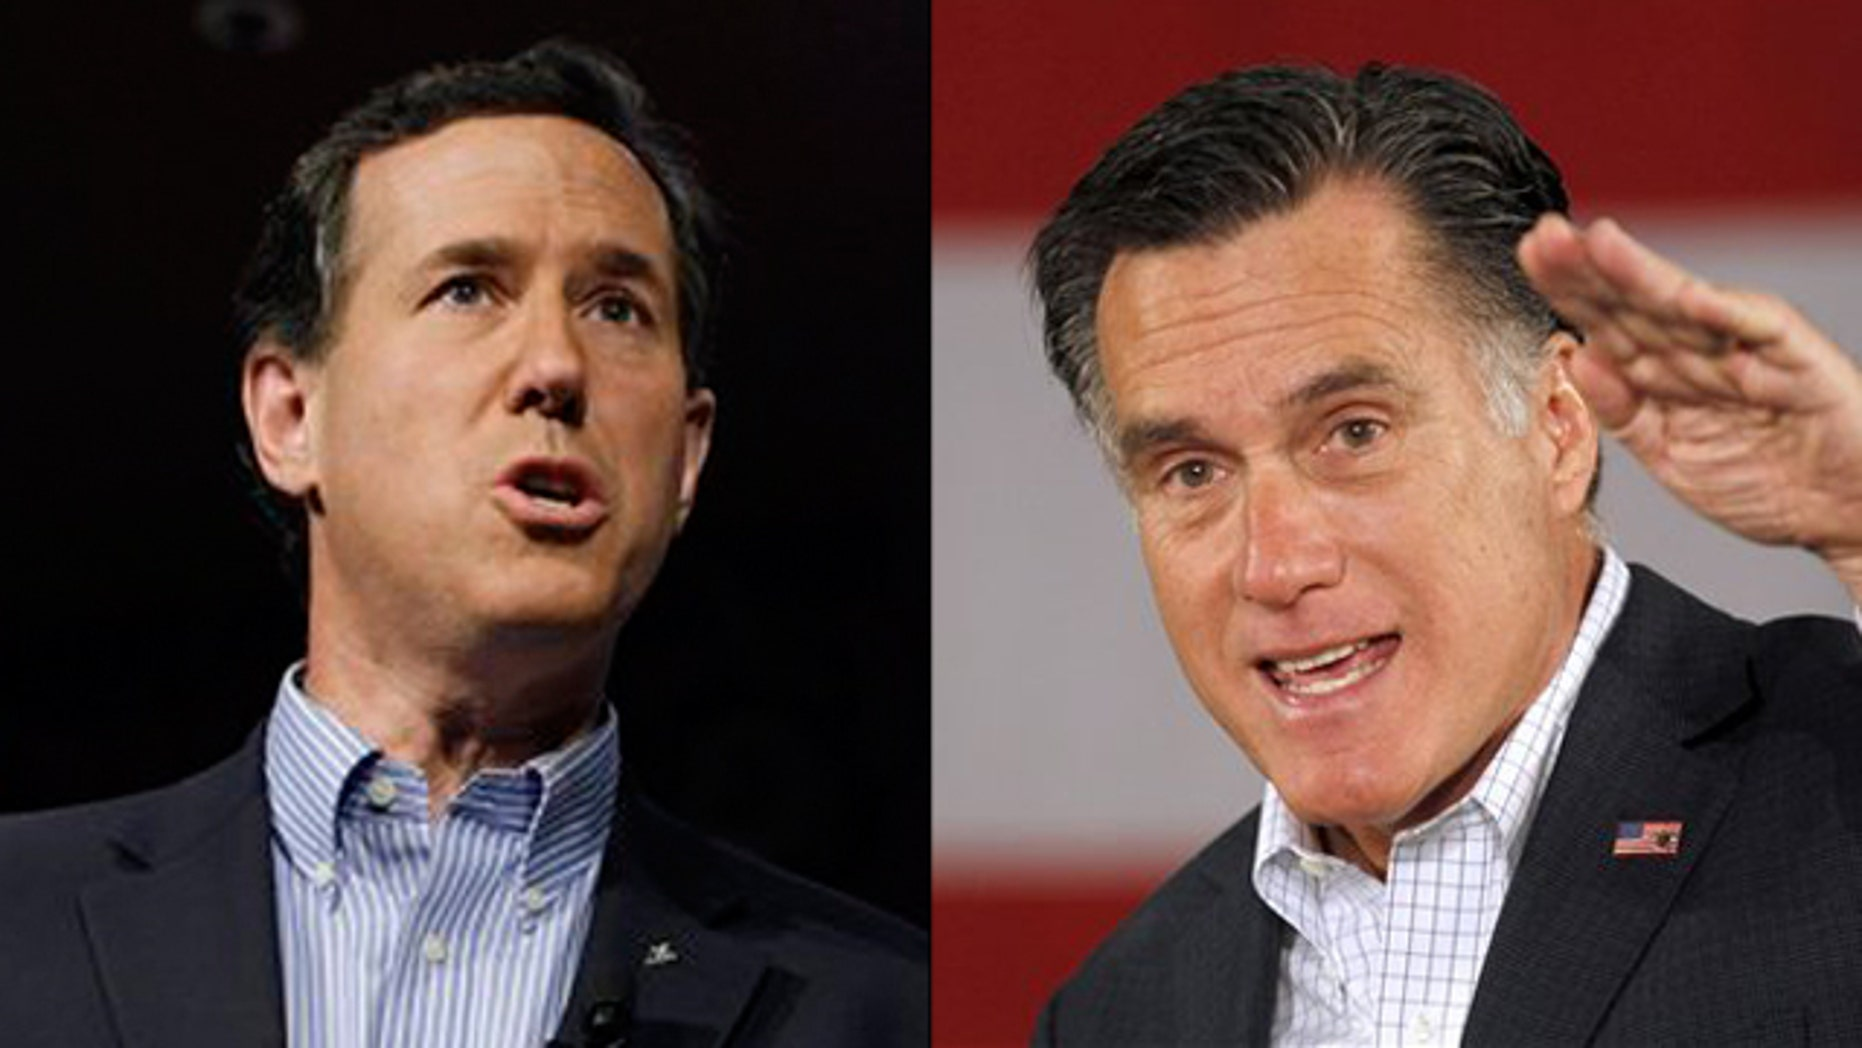 Shown here are Rick Santorum and Mitt Romney.